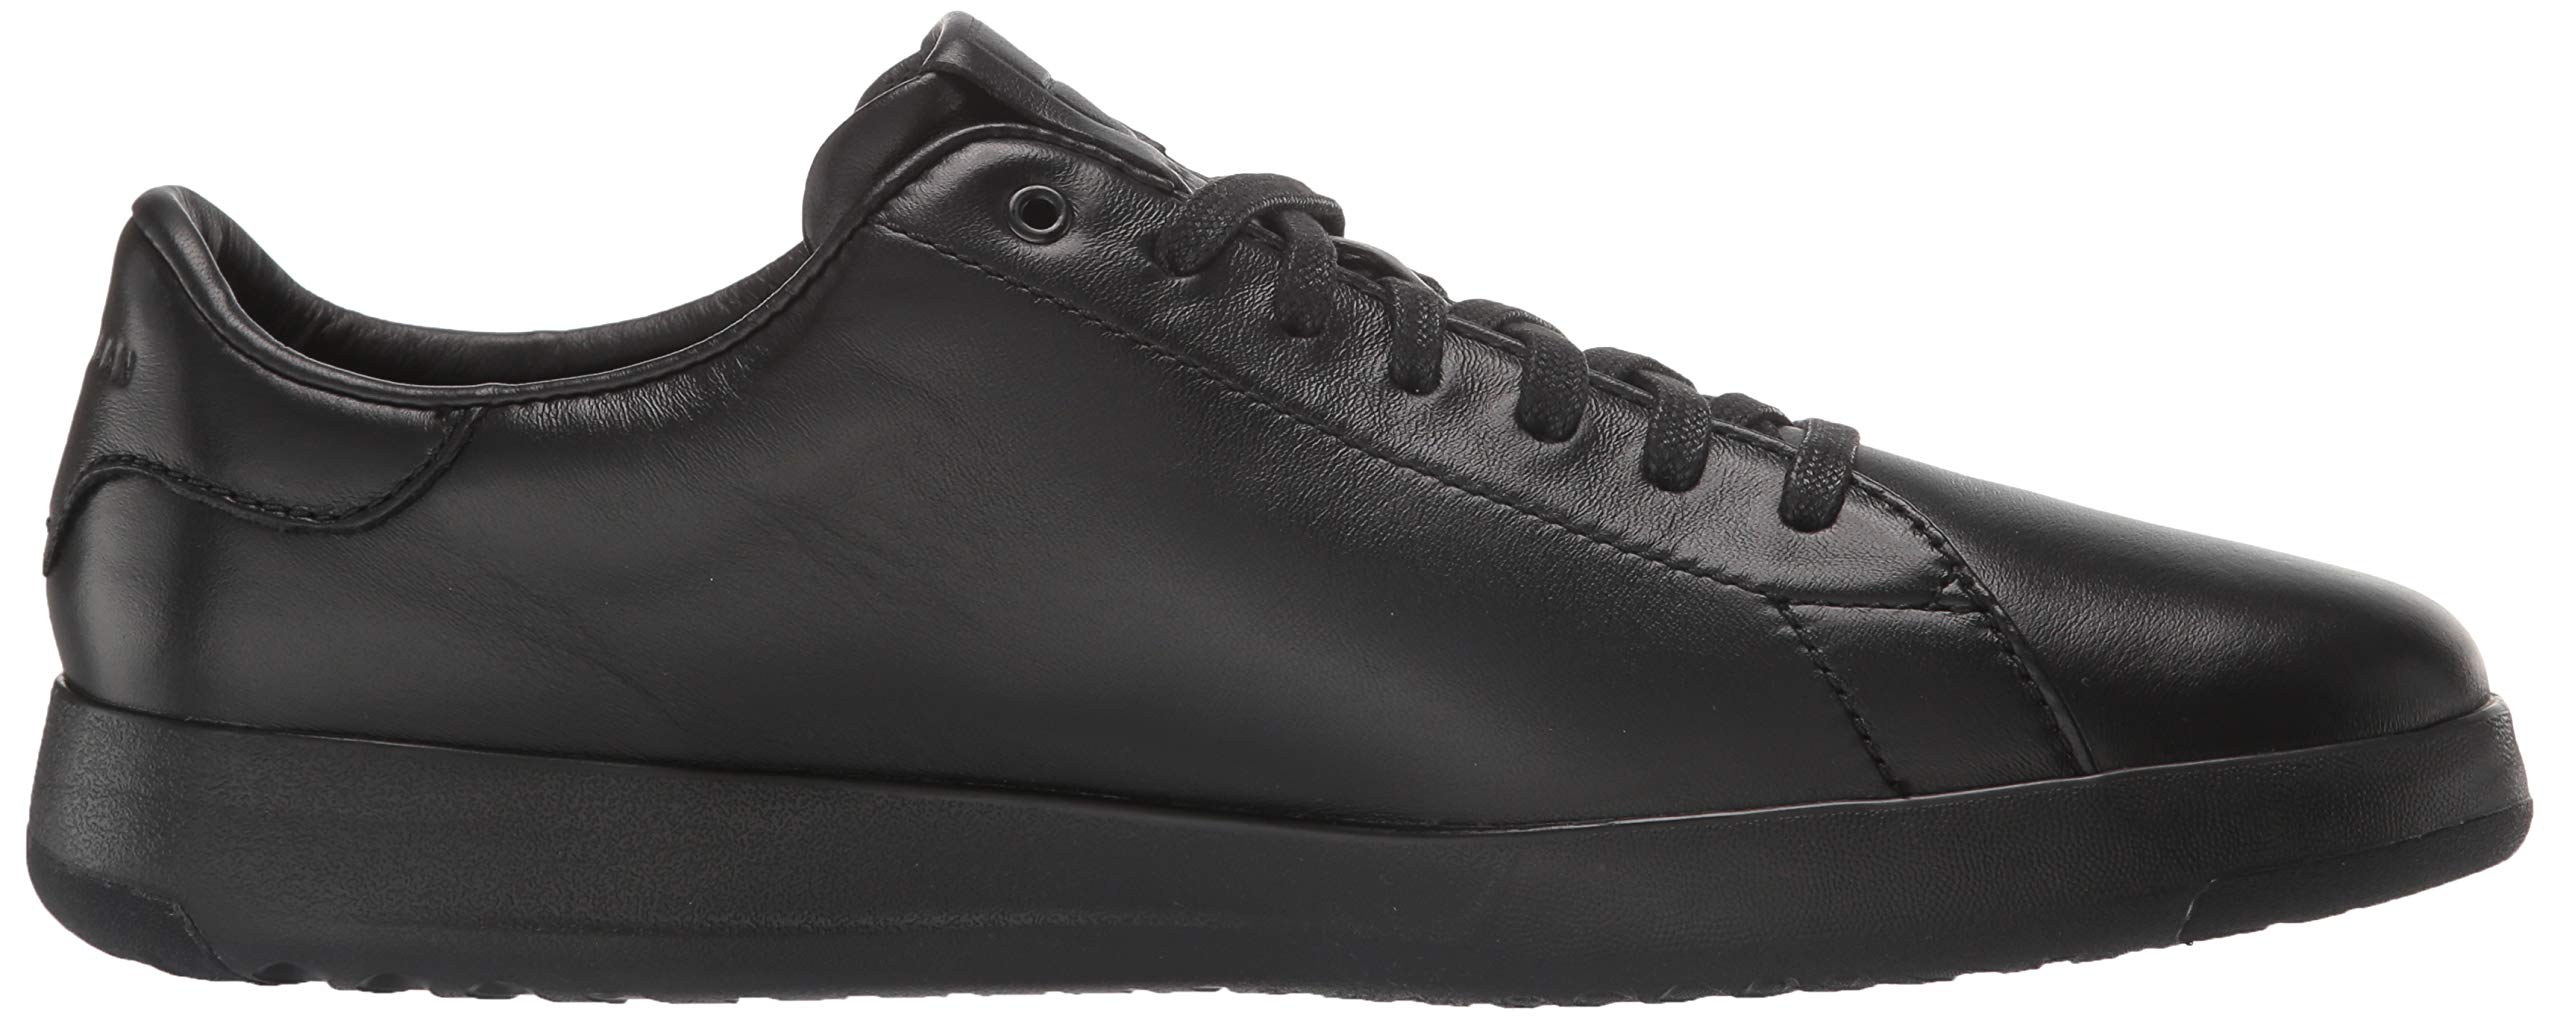 Cole Haan Men's Grandpro Tennis Fashion Sneaker, Black/British Tan, 7 M US by Cole Haan (Image #7)